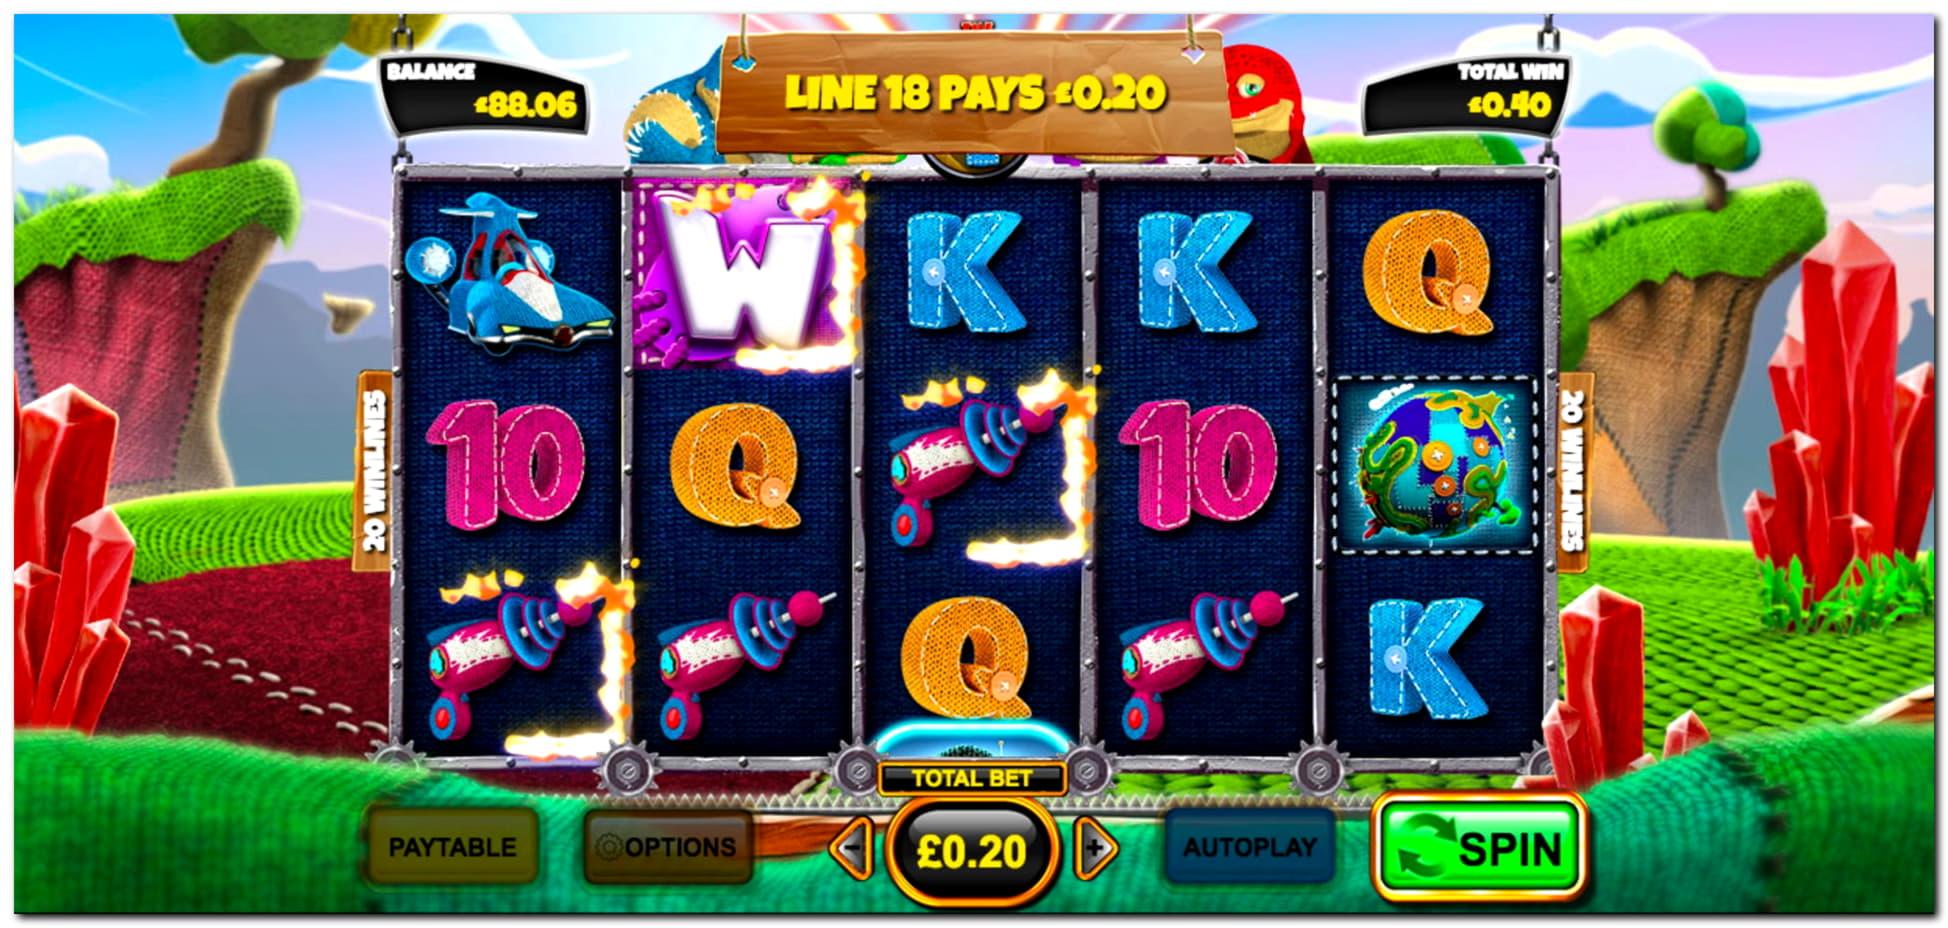 605% First deposit bonus at Video Slots Casino